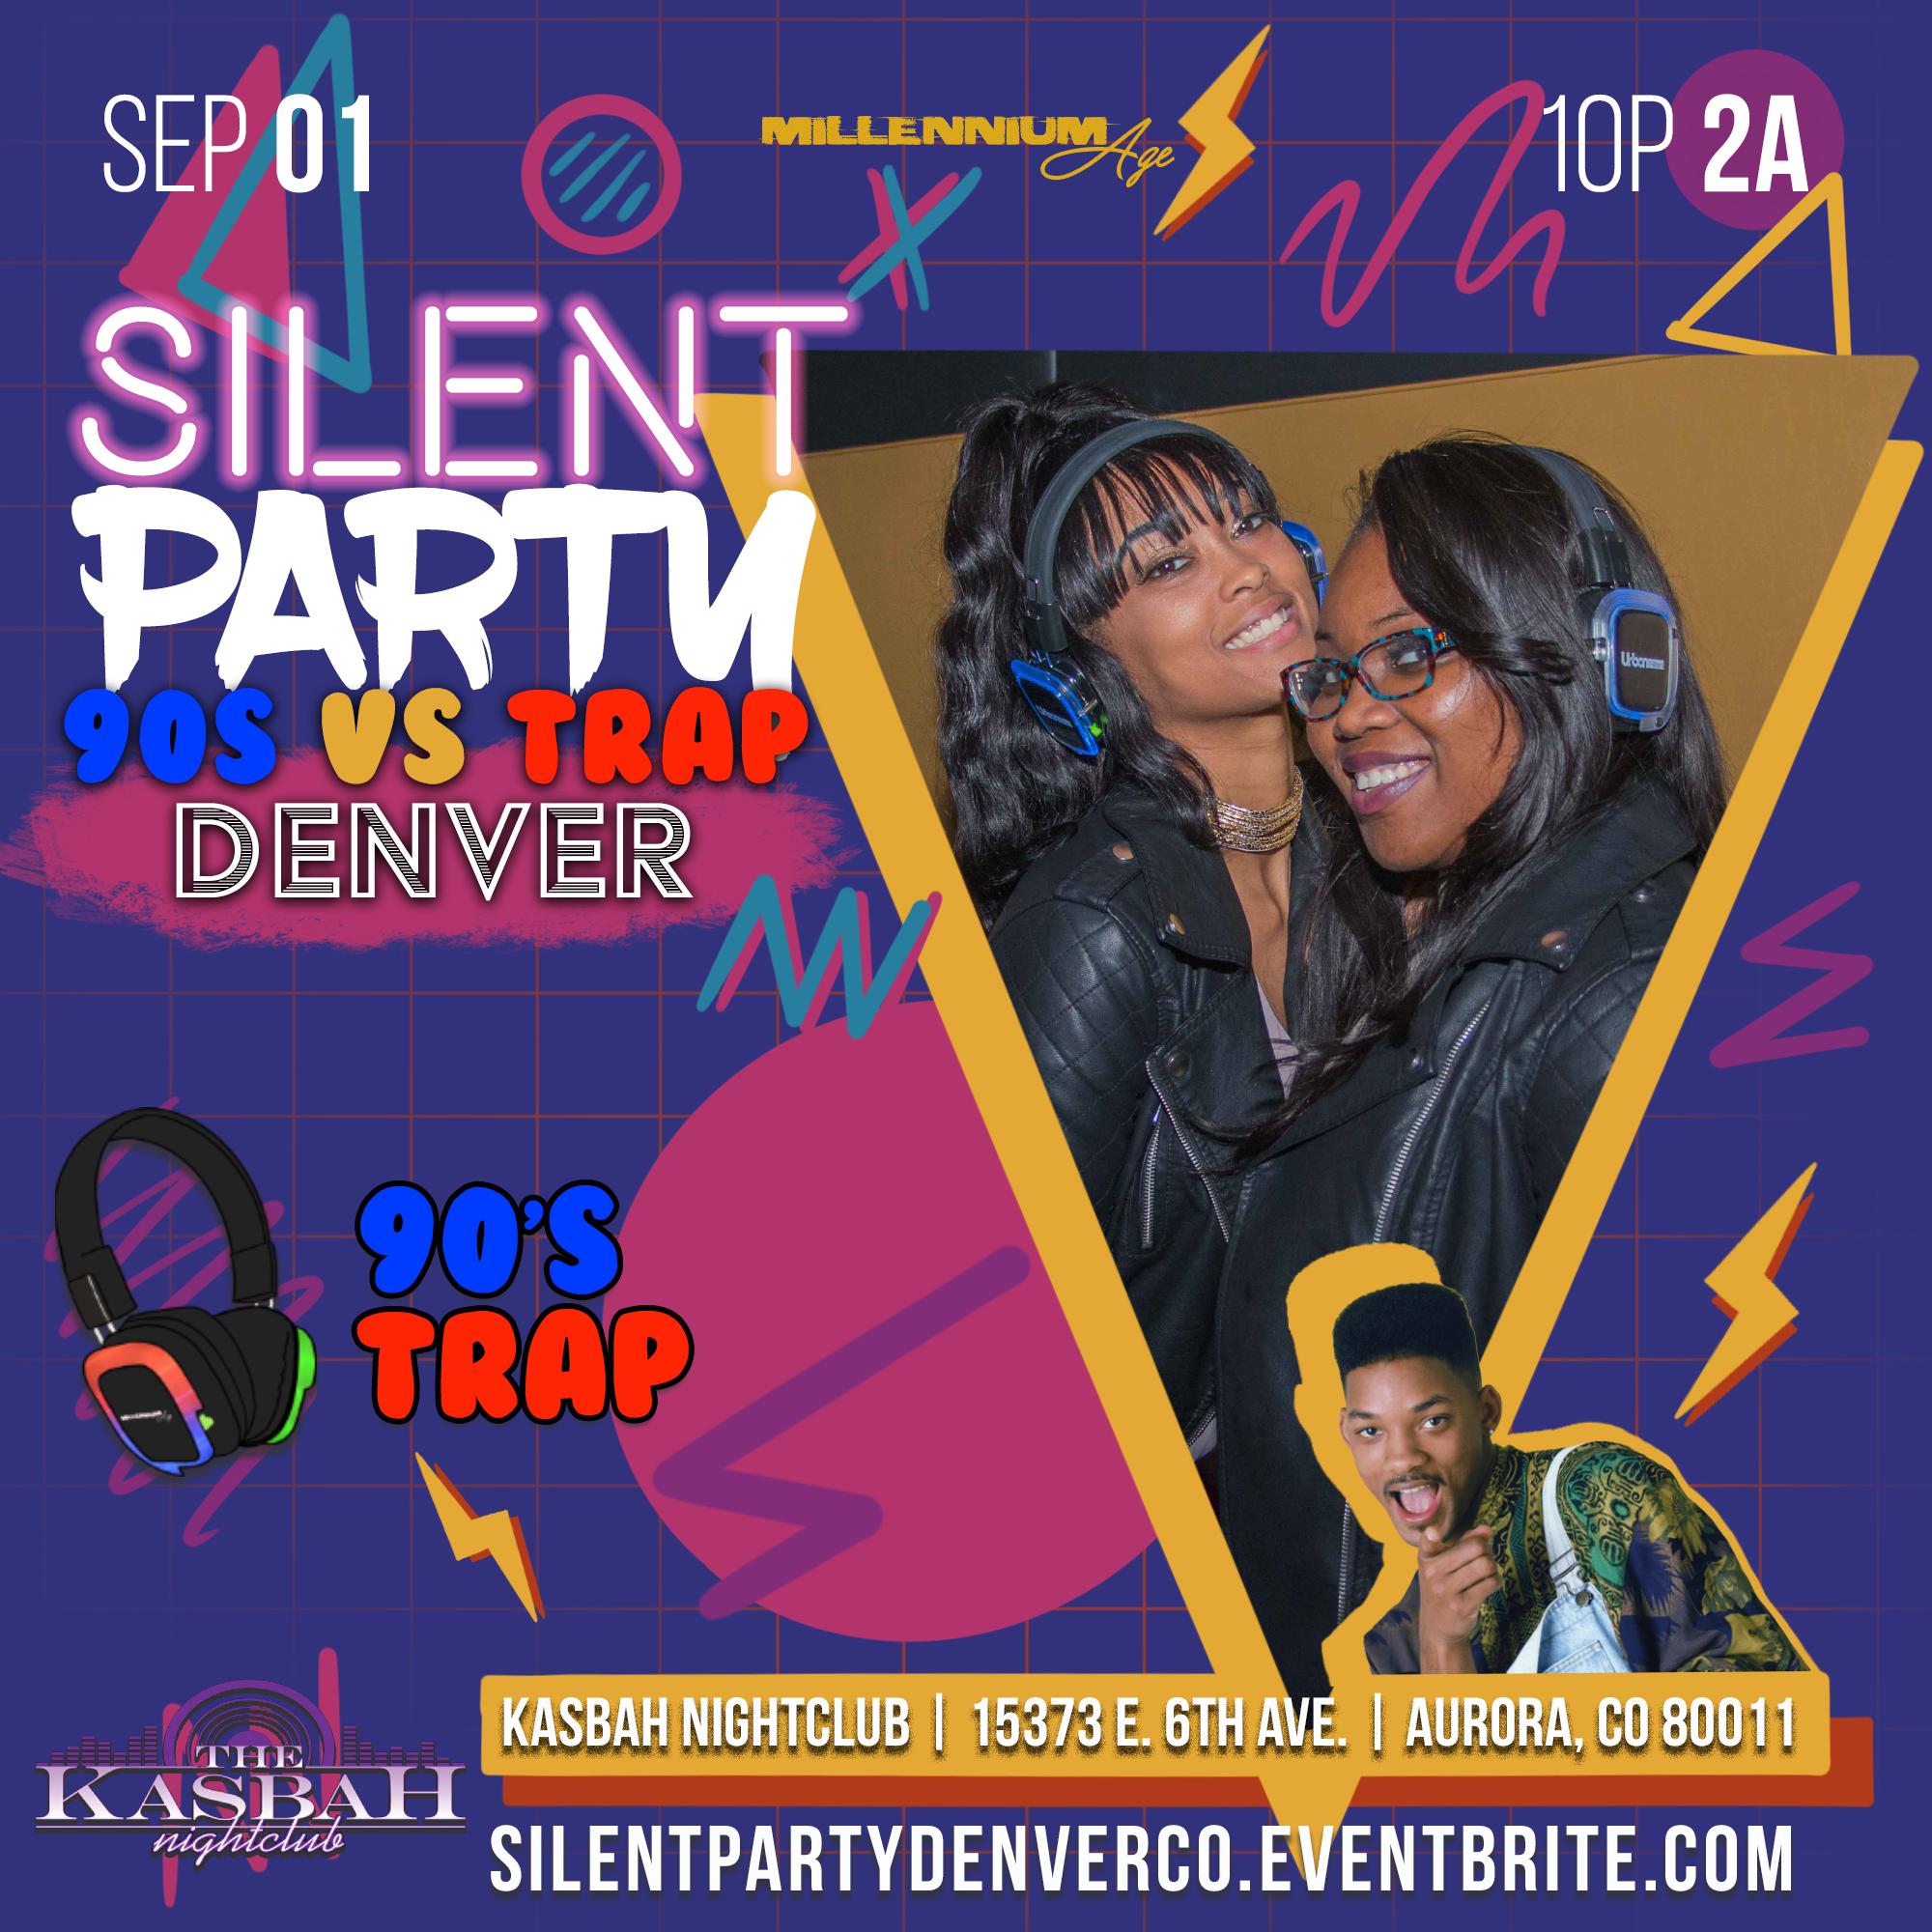 SilentParty-90SMAIN.png